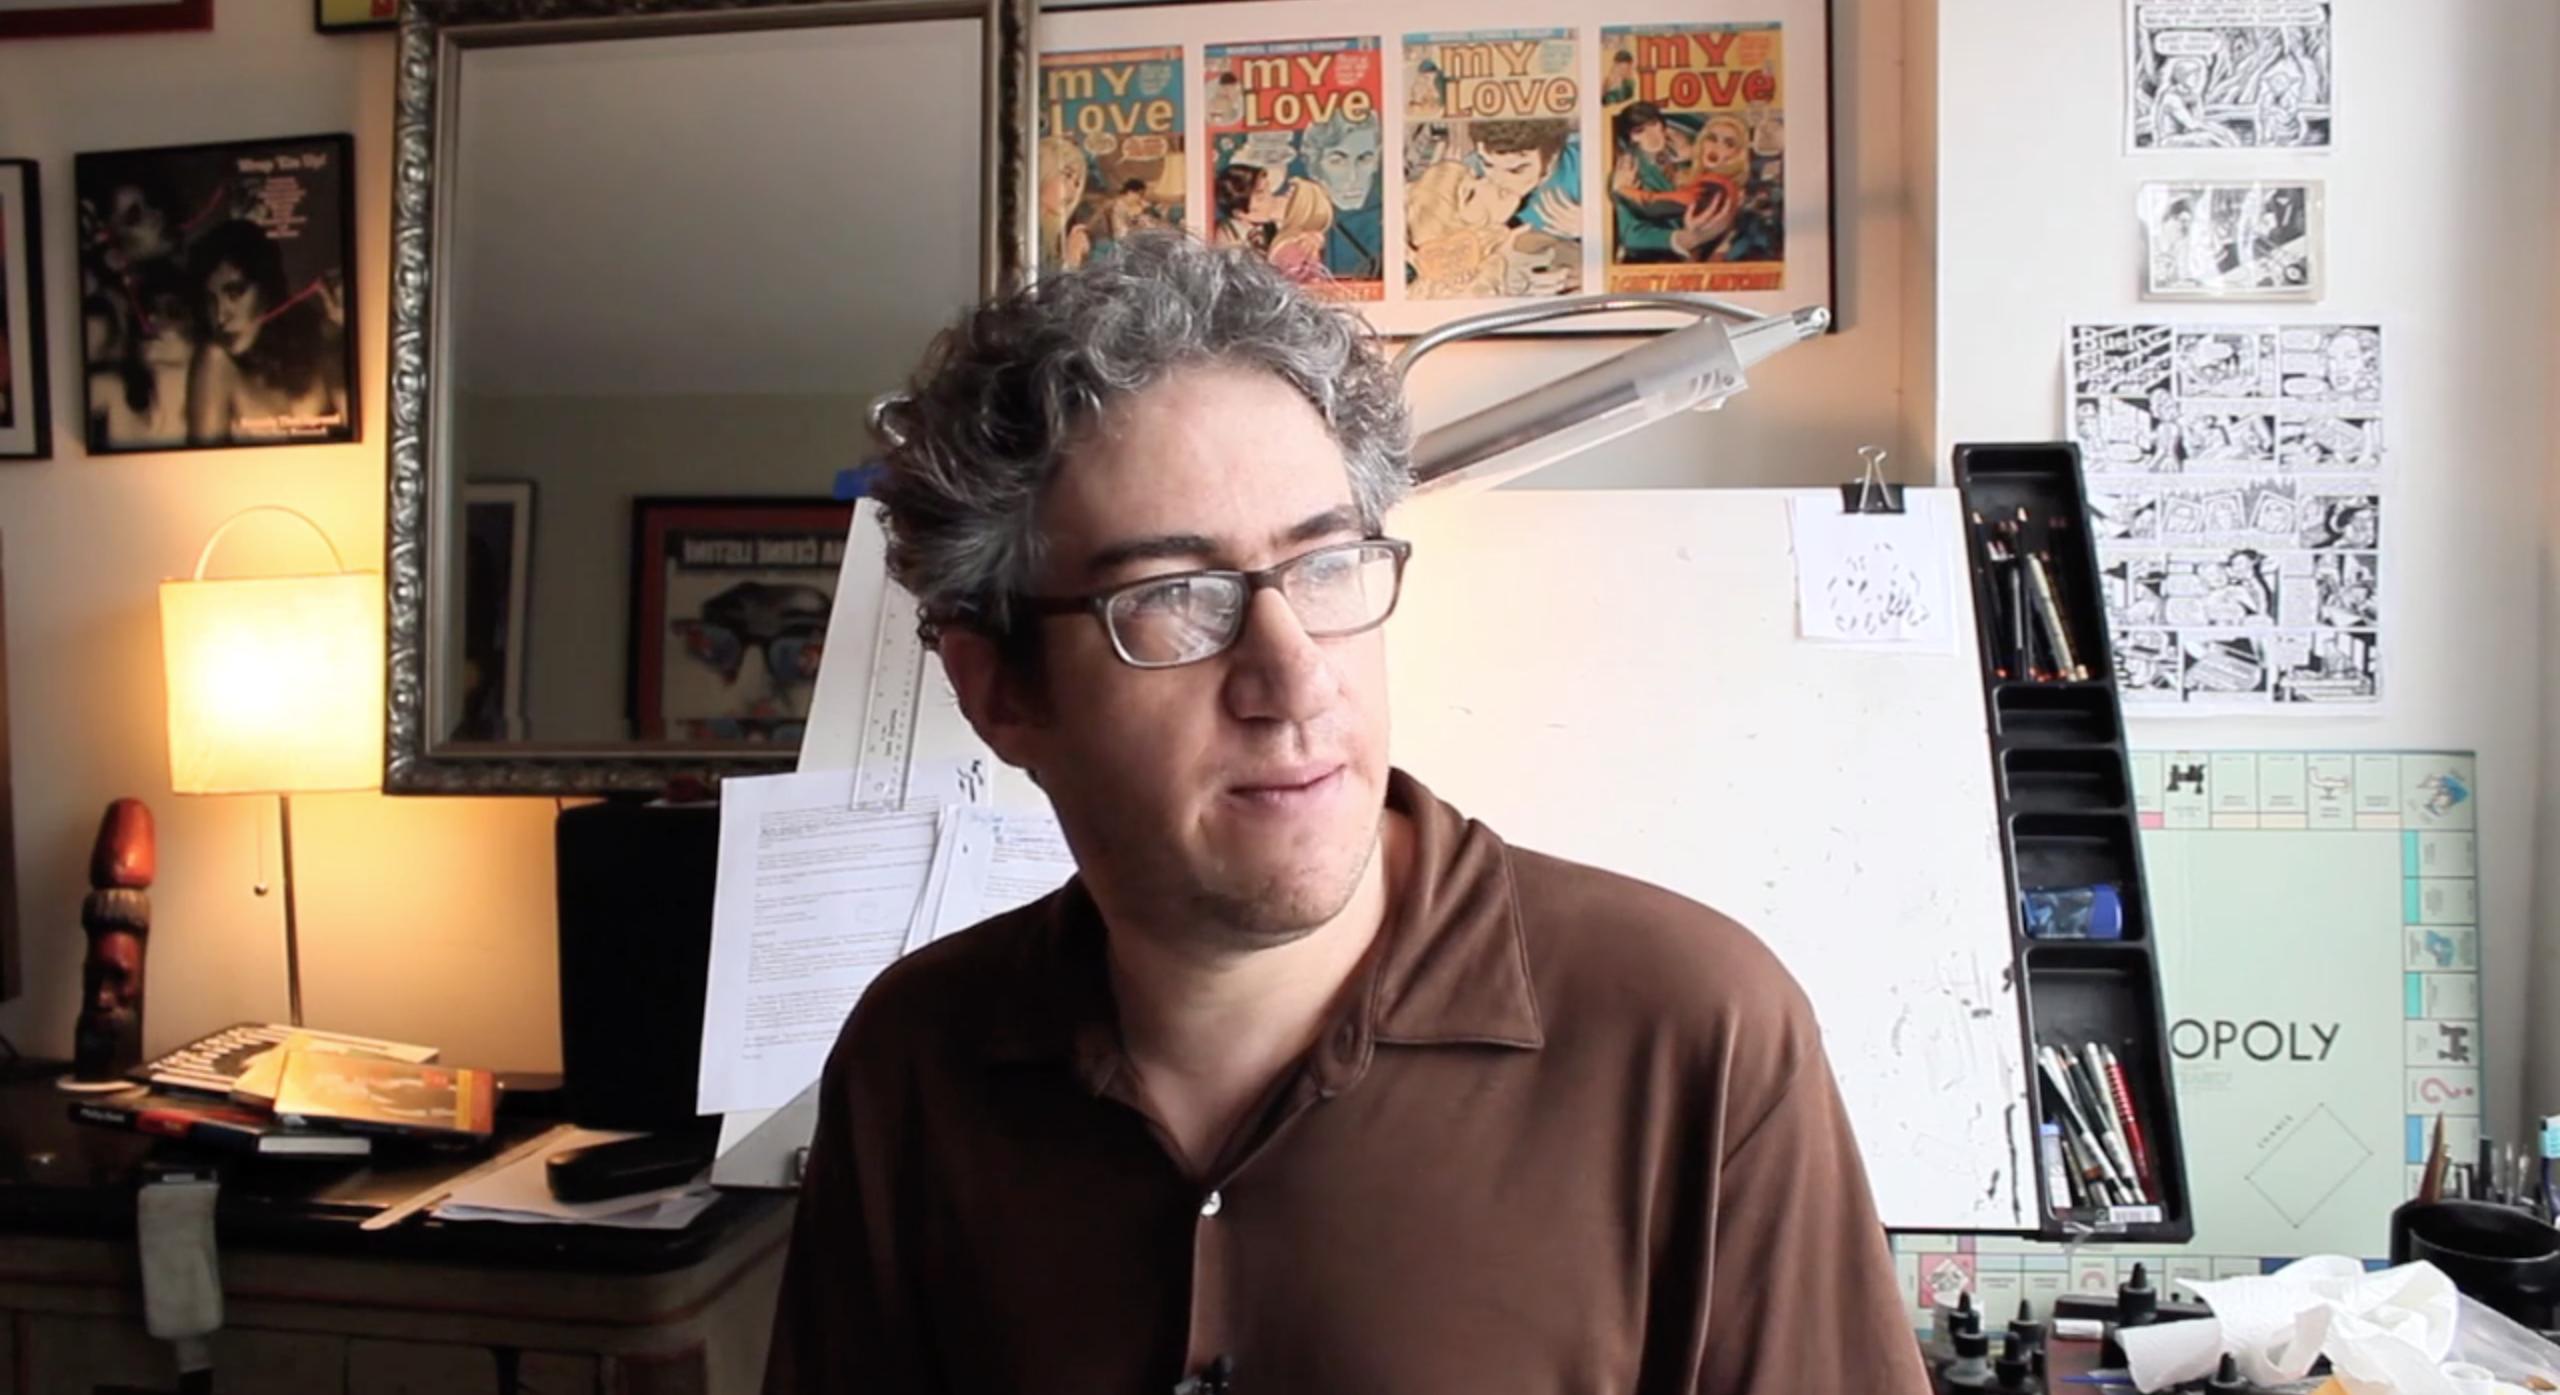 Eli Valley, a Jewish cartoonist whose work has long taken aim at Jewish leaders and institutions, has broadened his scope during the Trump era. (Screenshot/JTA-Vimeo)